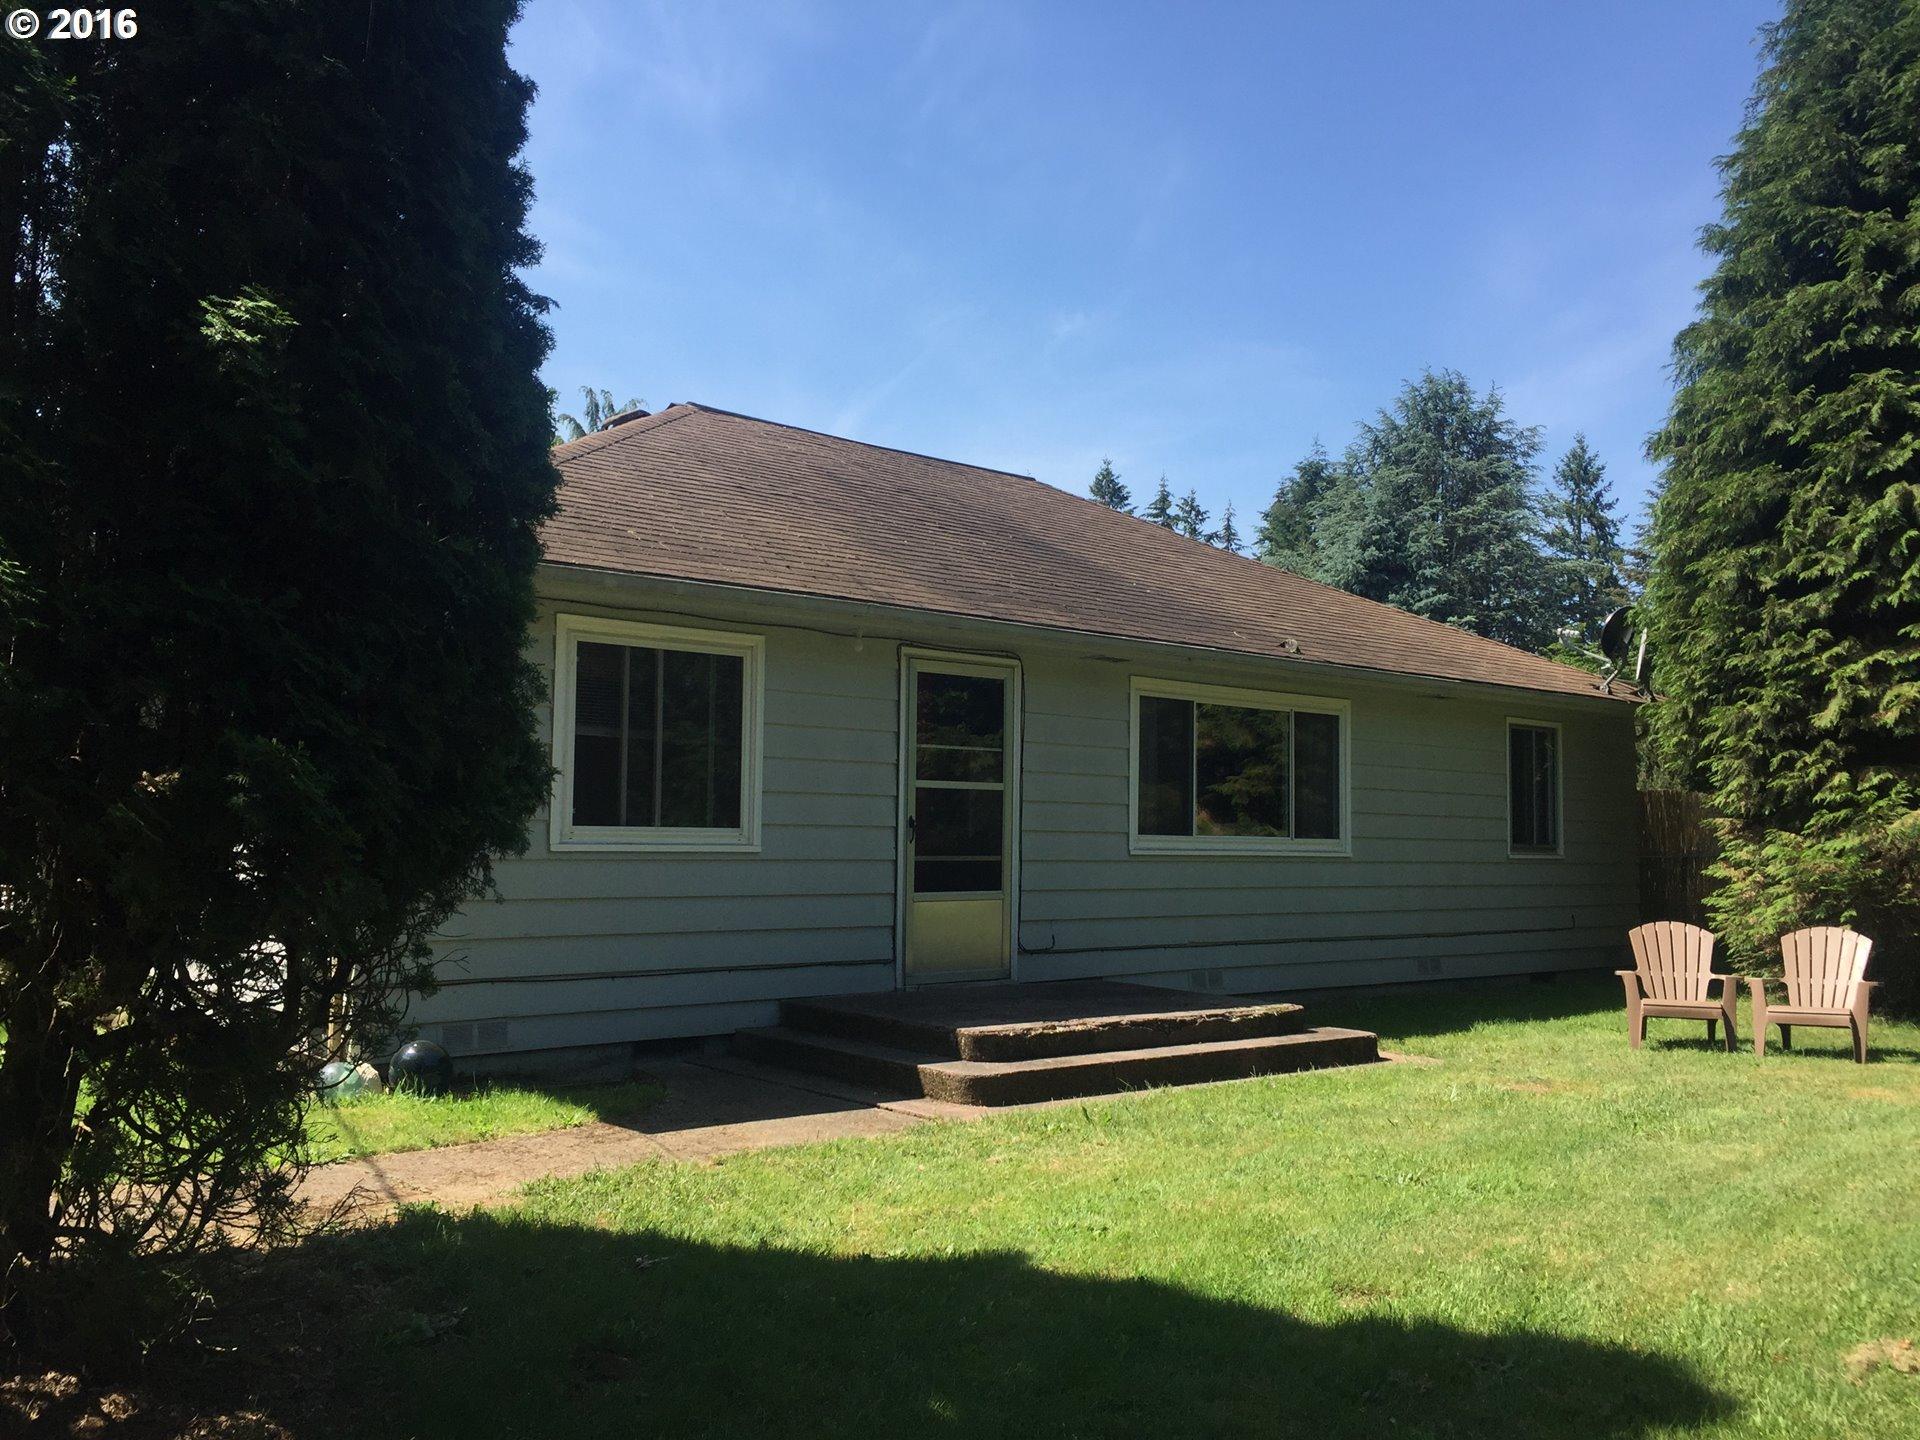 15701 NE 96TH ST, Vancouver, WA 98682